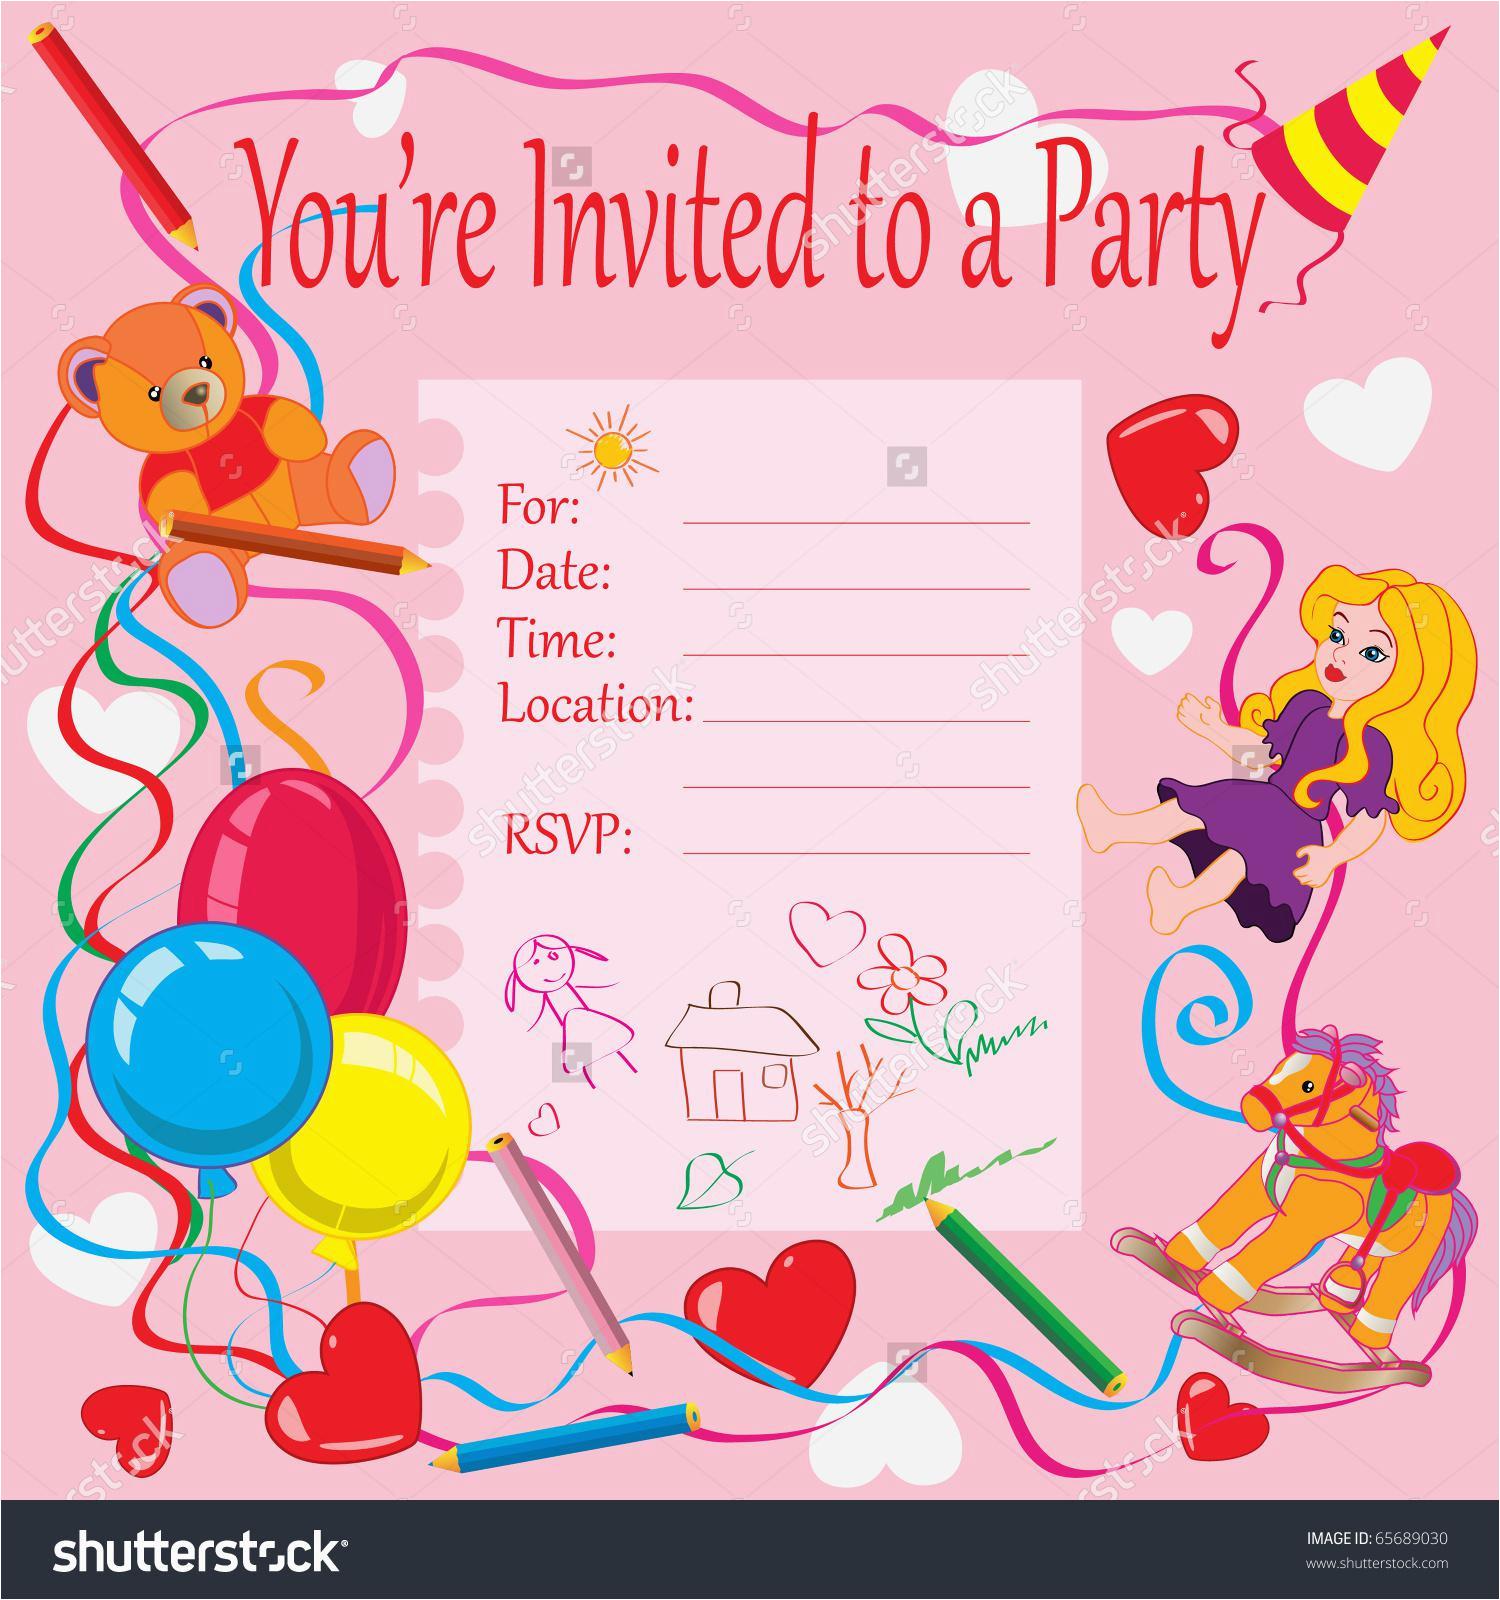 Inviting Cards For A Birthday Birthdaybuzz